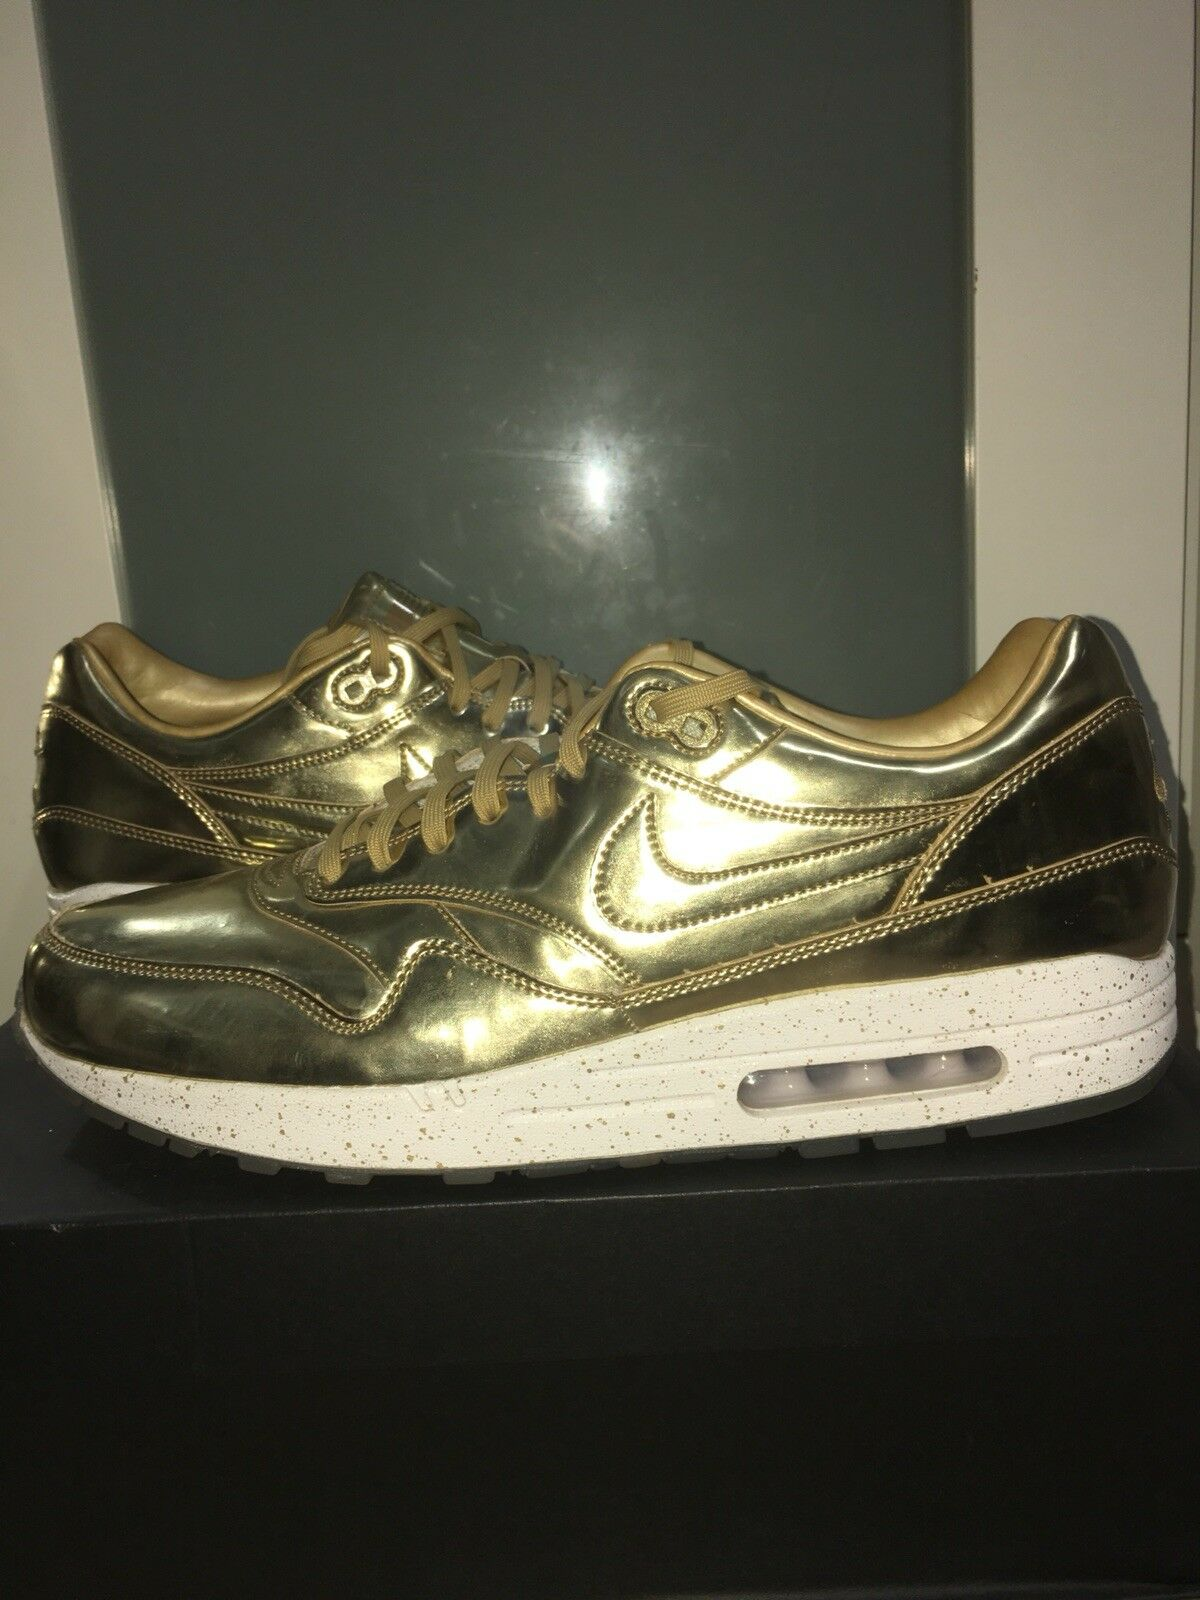 Nike Air Max 1 gold Olympic USA Size 13 Nike ID Box Rare Option